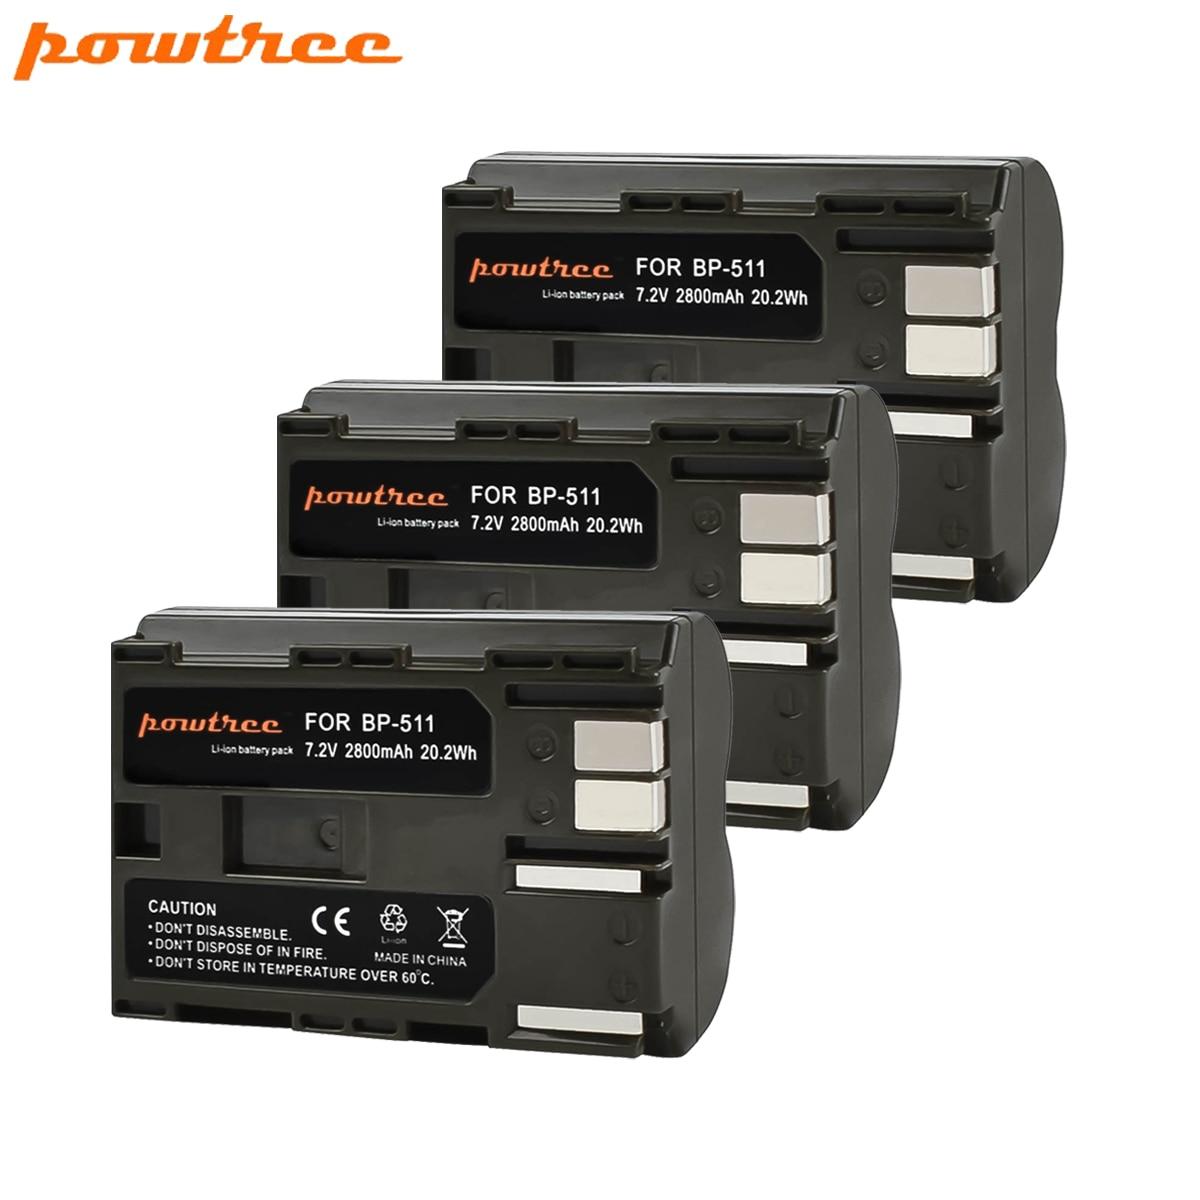 Powtree 2800mAh BP-511 BP-511A BP 511A For Camera Battery BP511 BP 511 For Canon EOS 40D 300D 5D 20D 30D 50D 10D G6 L10